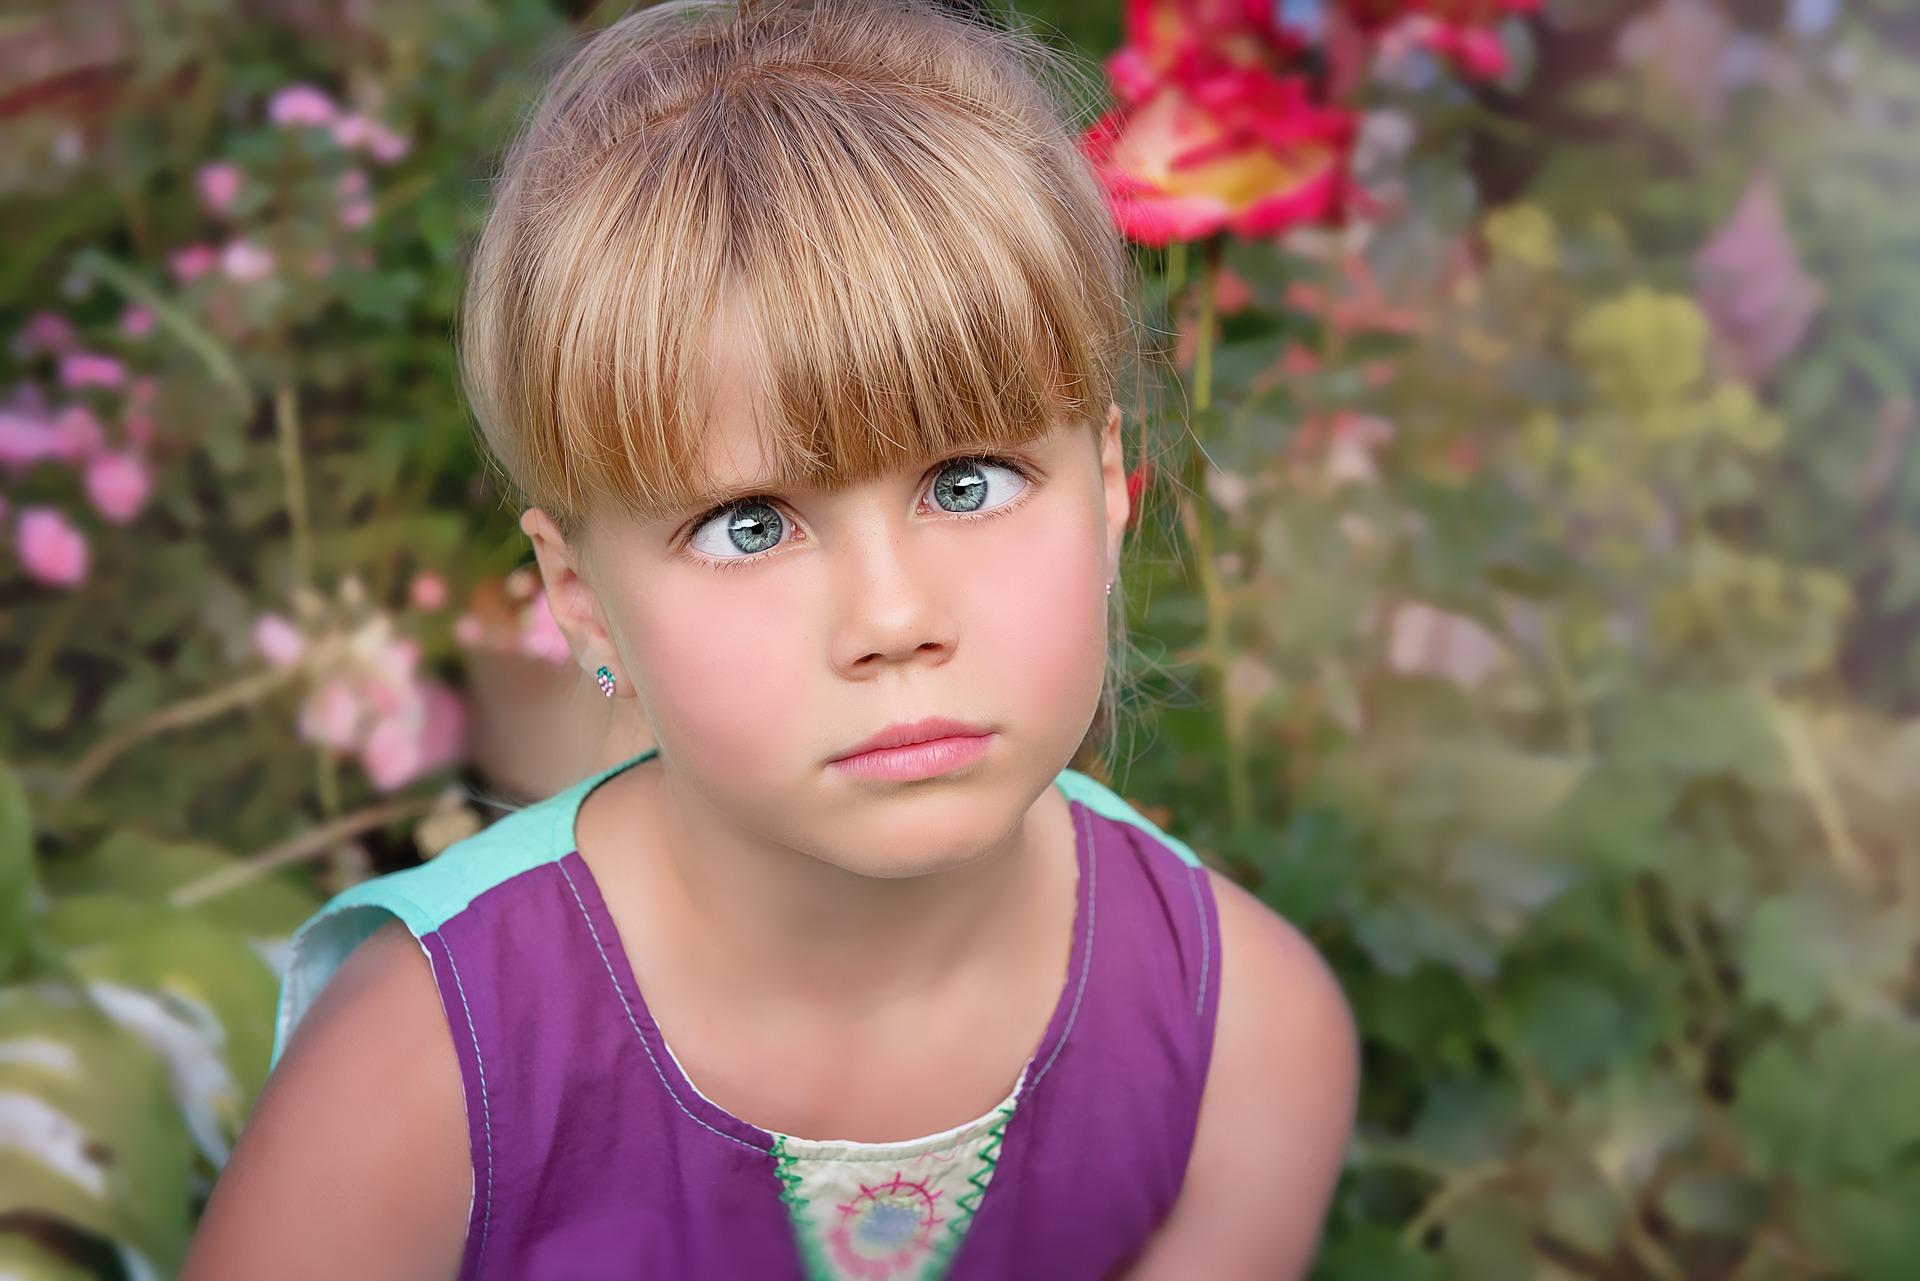 Woher kommt Schielen bei Kindern? » Krank.de